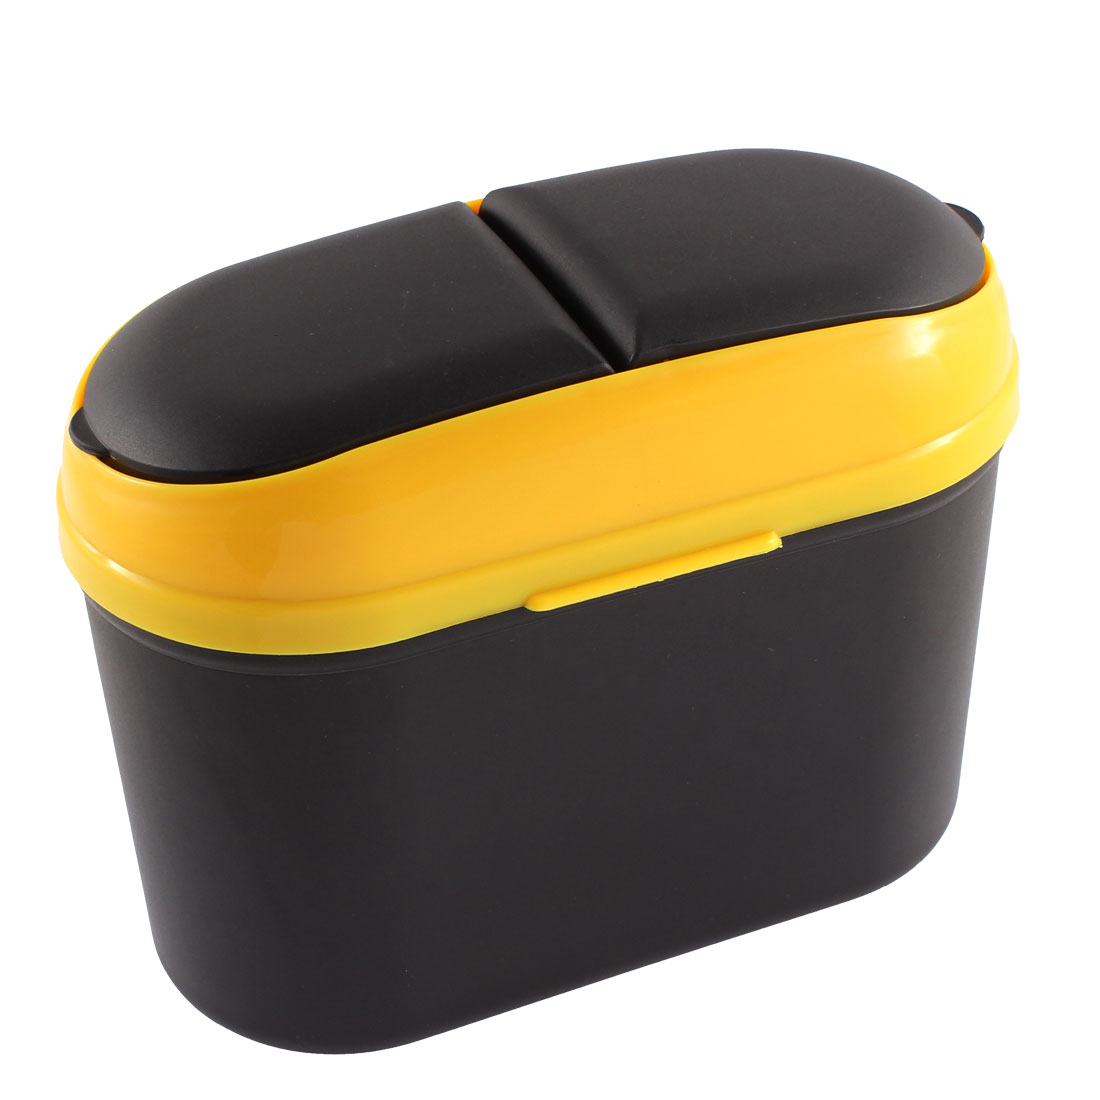 Car SUV Trash Rubbish Can Garbage Dust Dustbin Box Case Holder Bin Hook Black Yellow